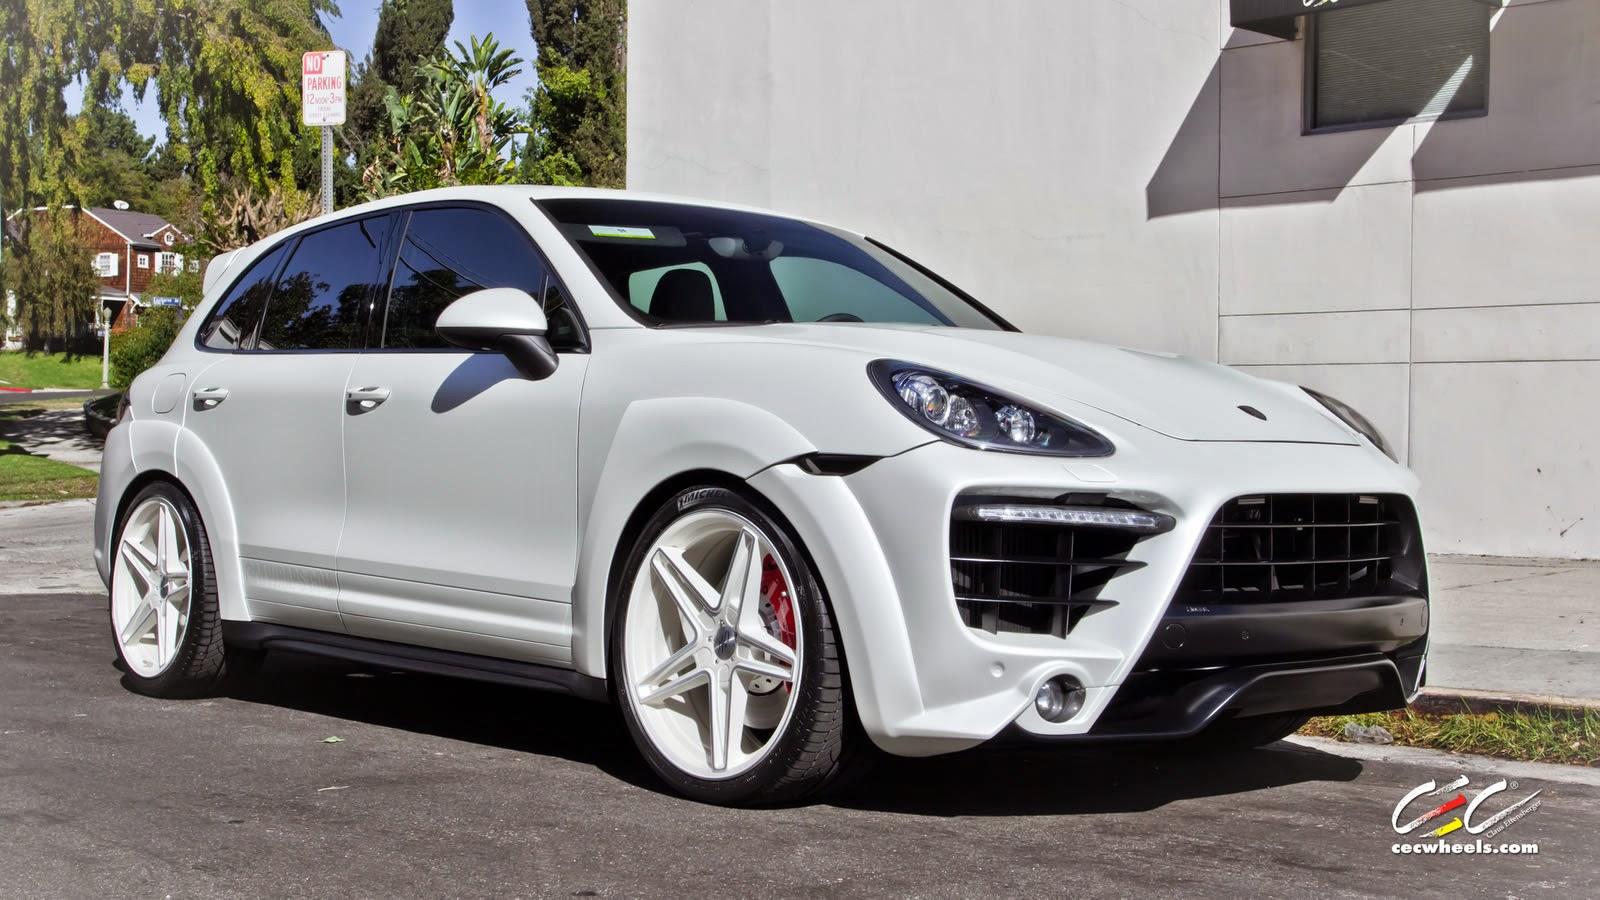 Porsche cayenne turbo cec wheels supercars show - Super sayenne ...